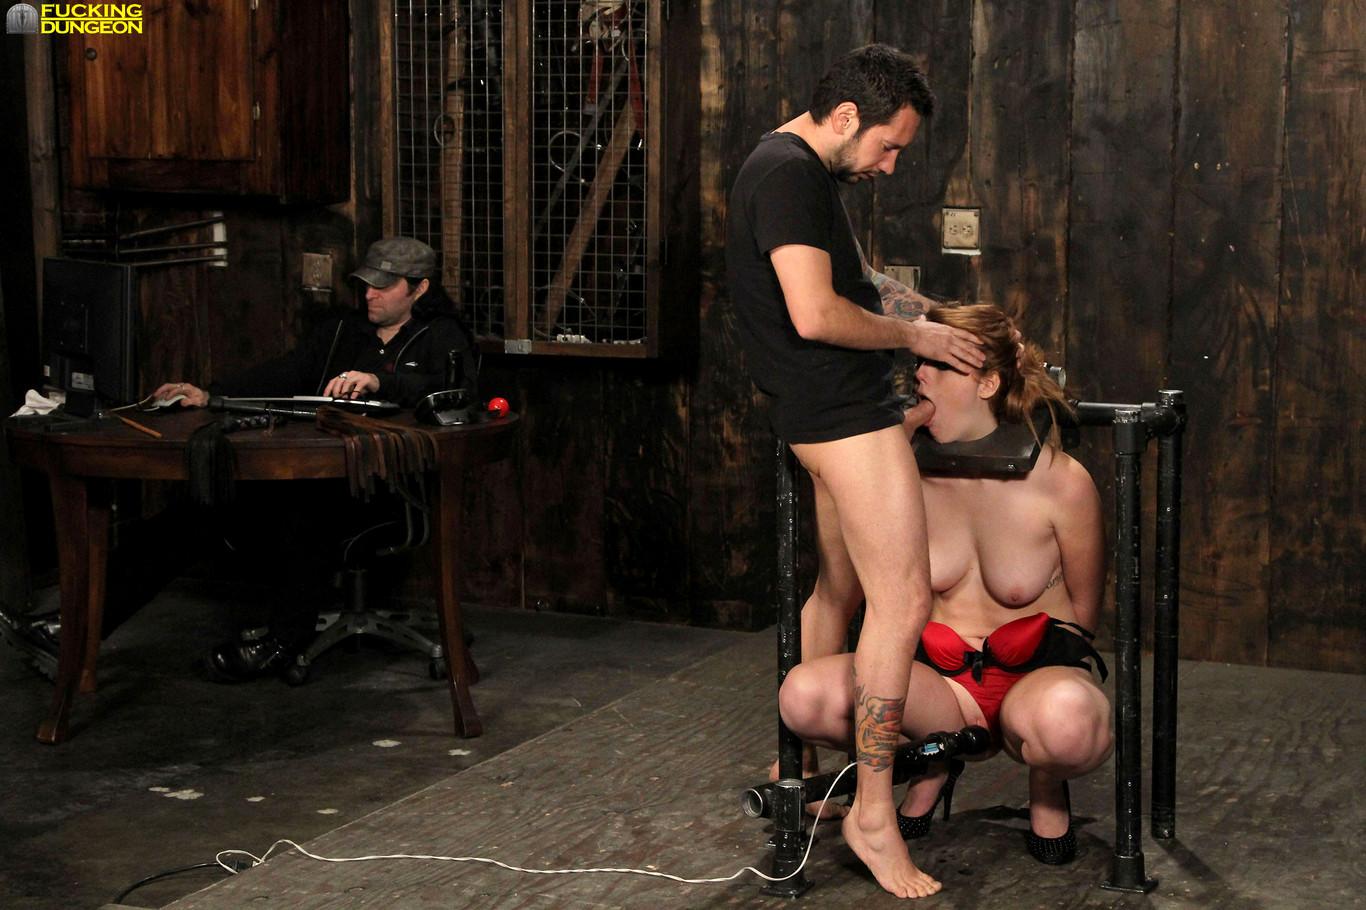 sex-slave-dungeon-chloe-vevrier-hard-core